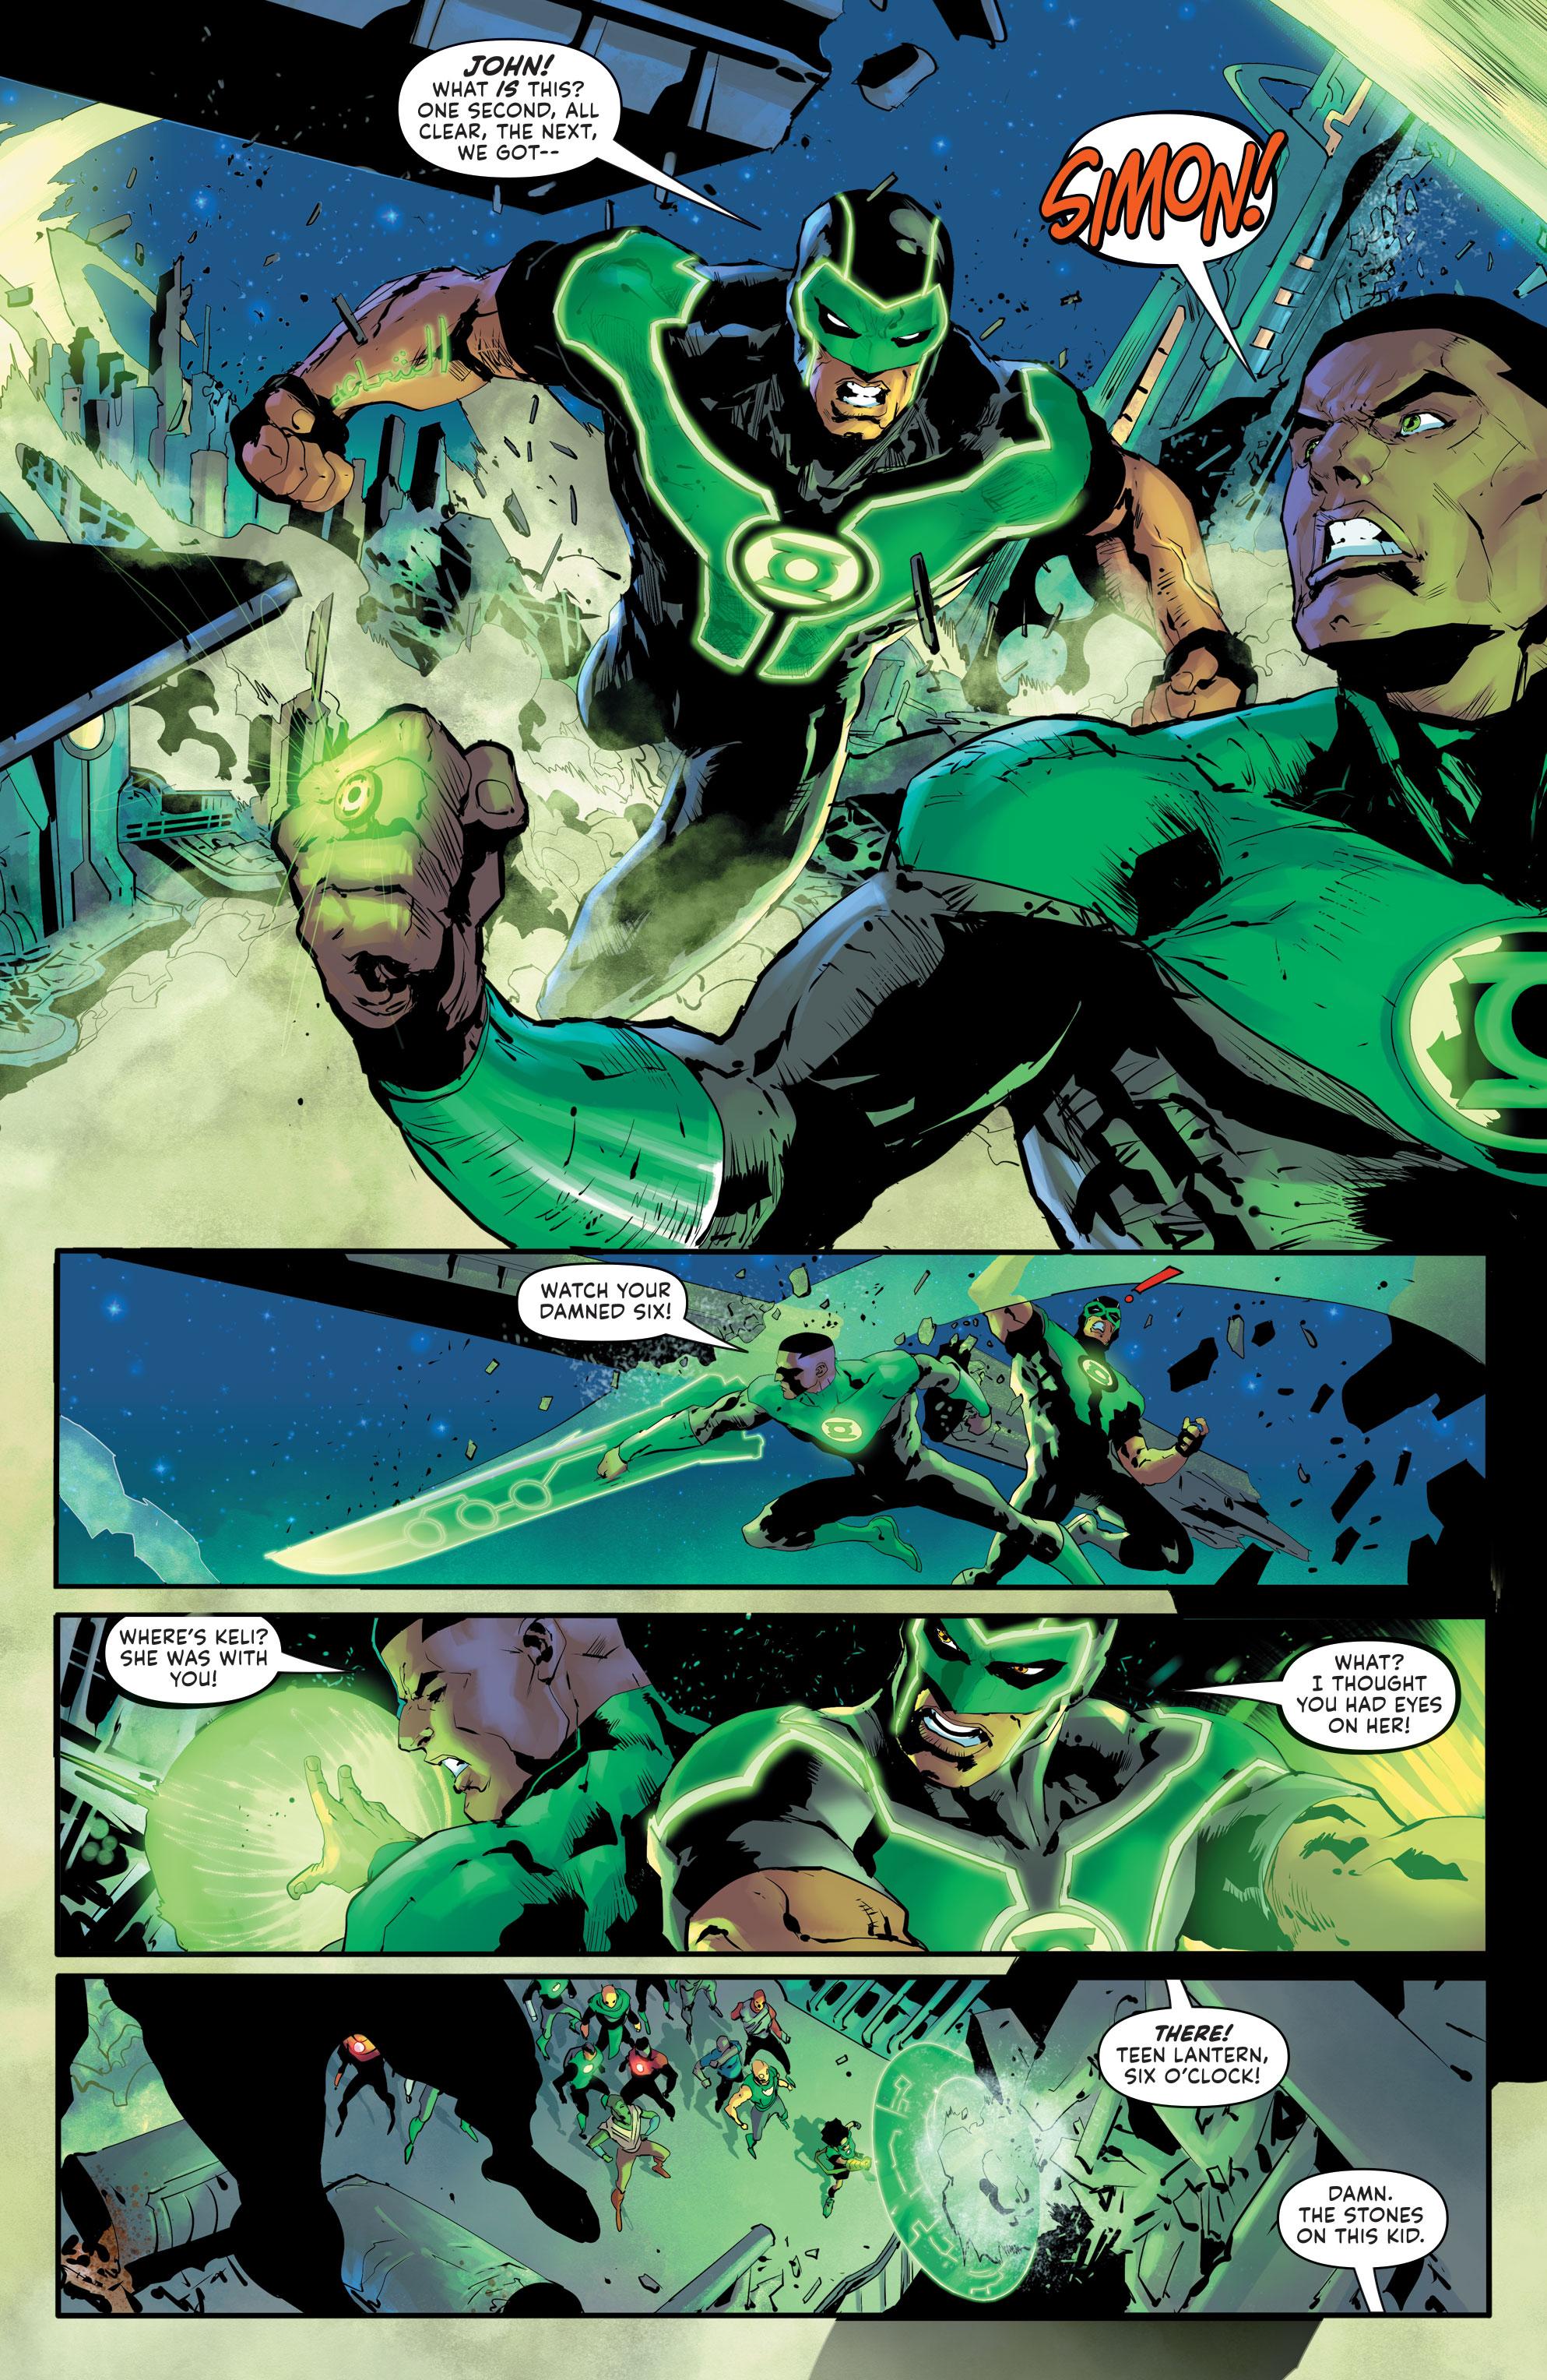 Green-Lantern-1-4_60667975548139_002